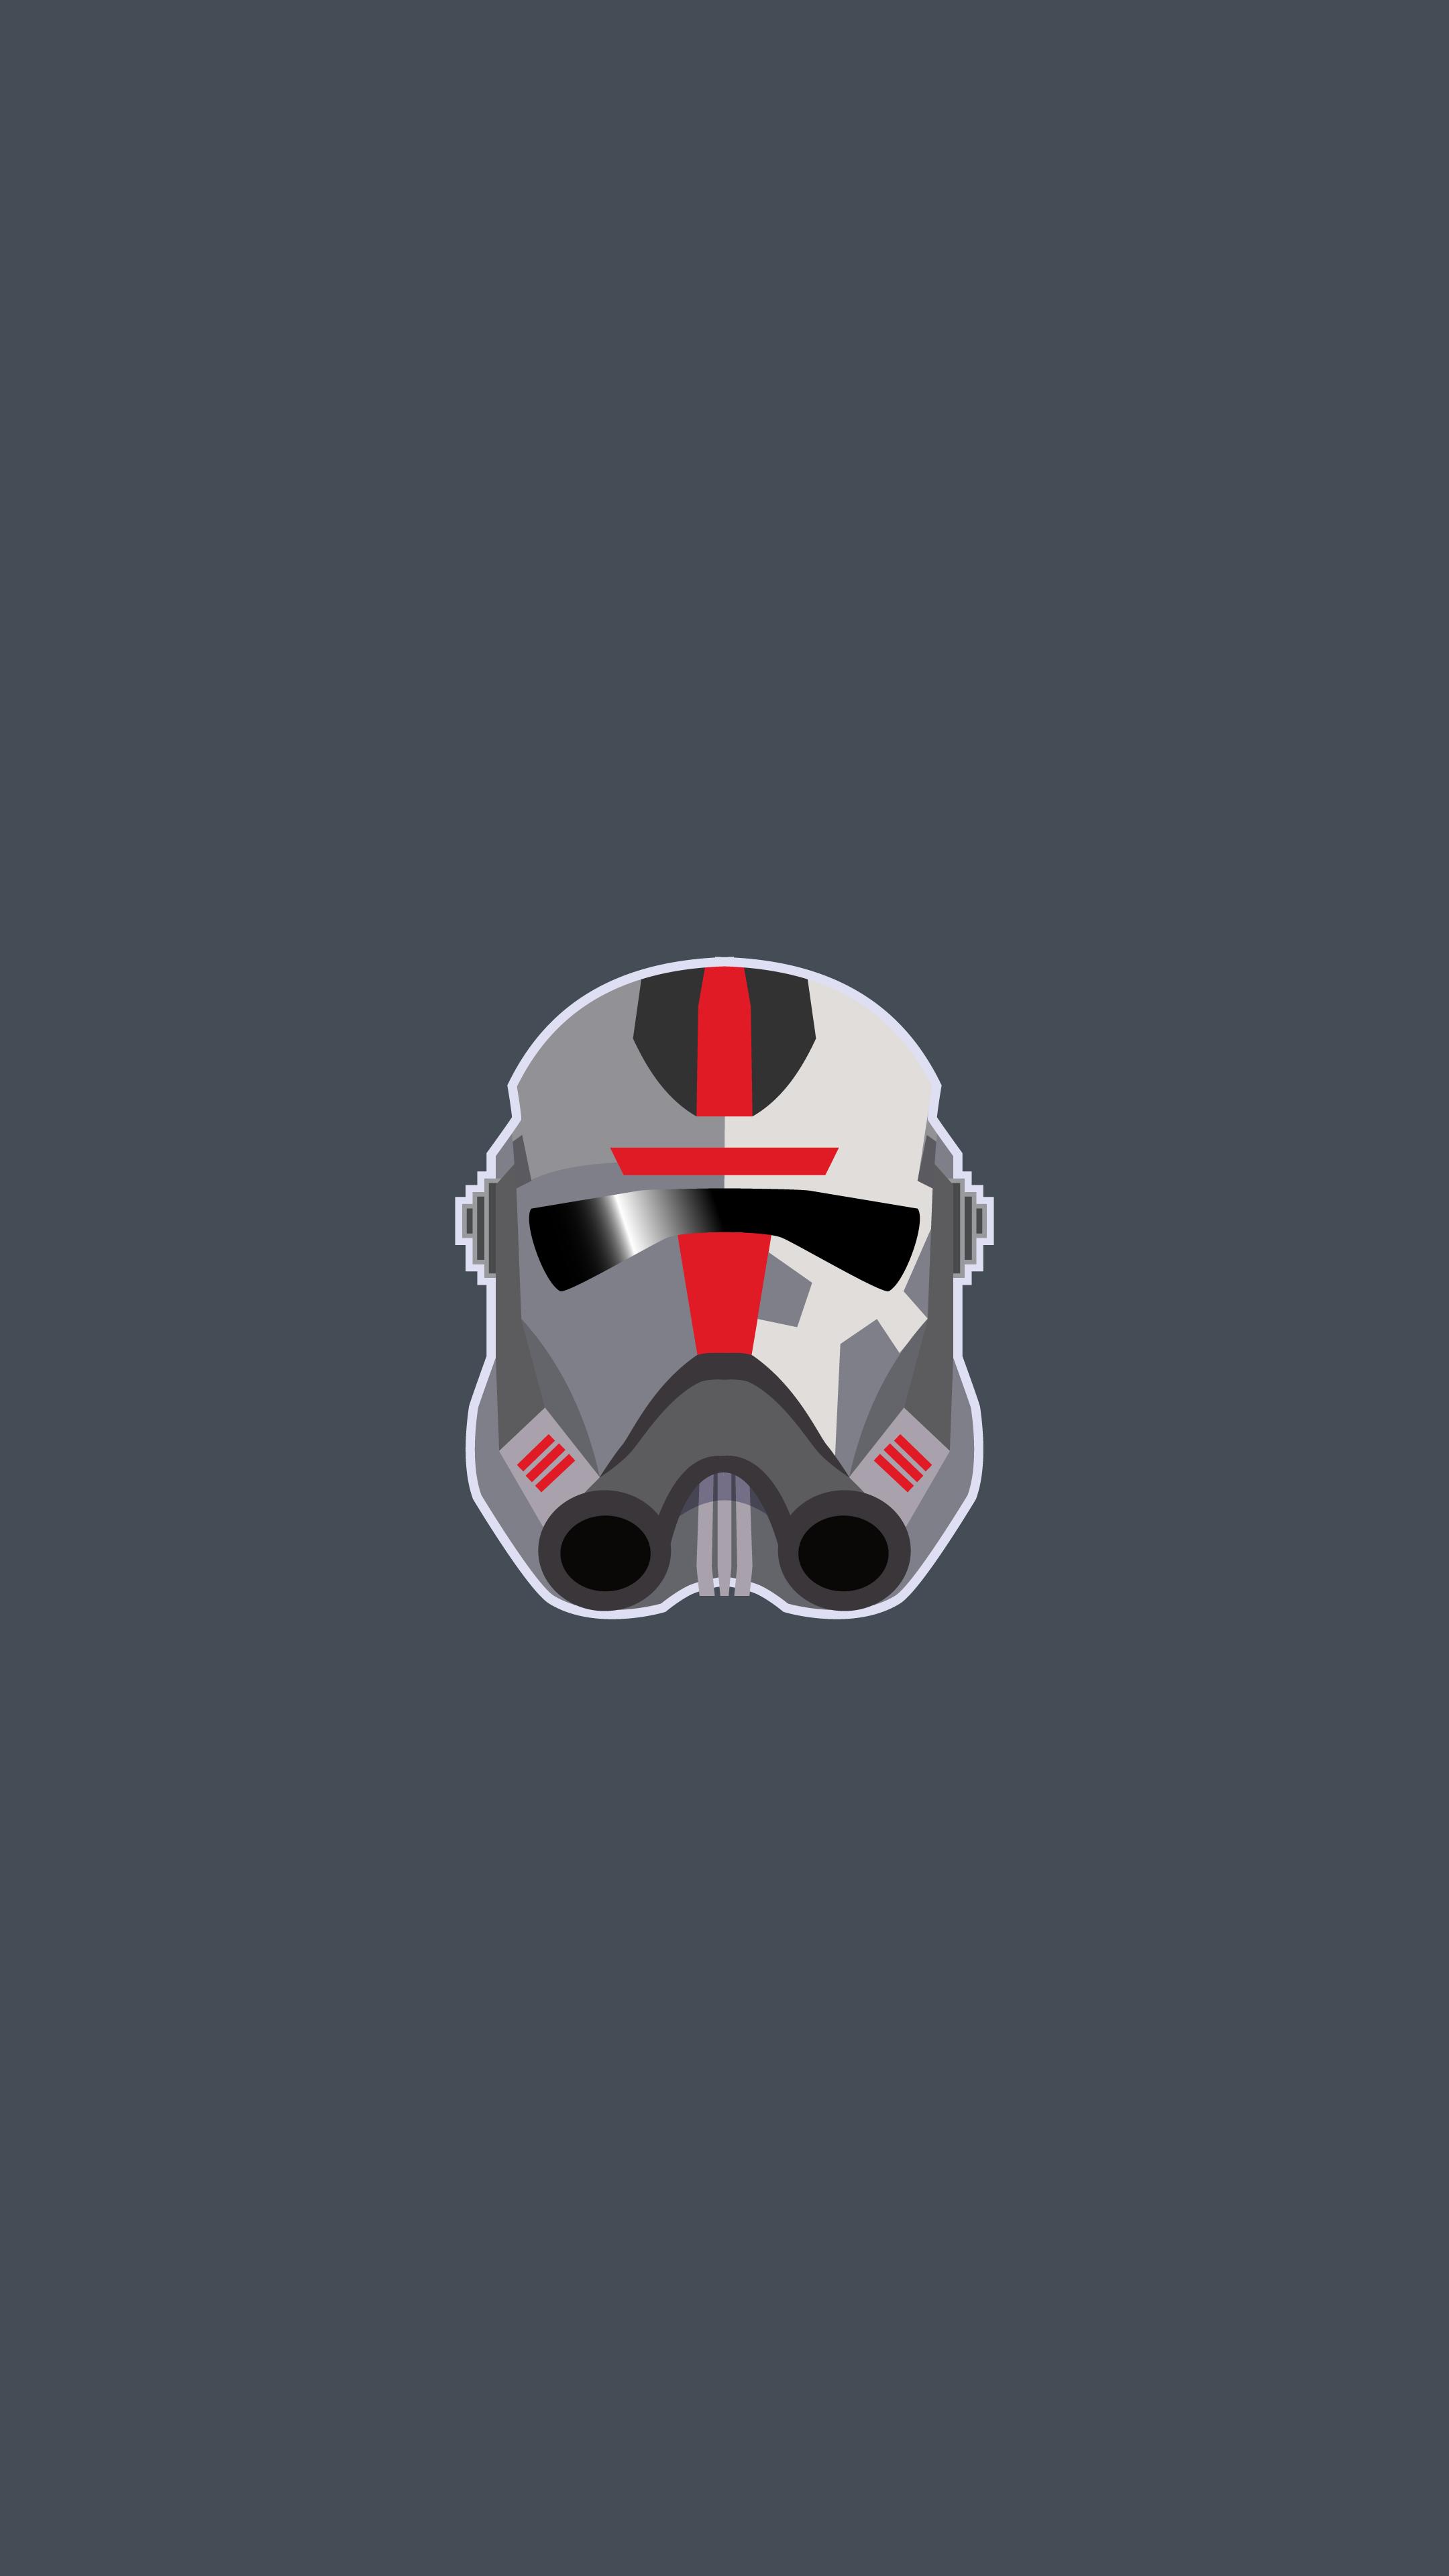 Star Wars Bad Batch Star Wars Bad Batch Helmet Clone Trooper TV Series Minimalism Gray Background Po 2160x3840